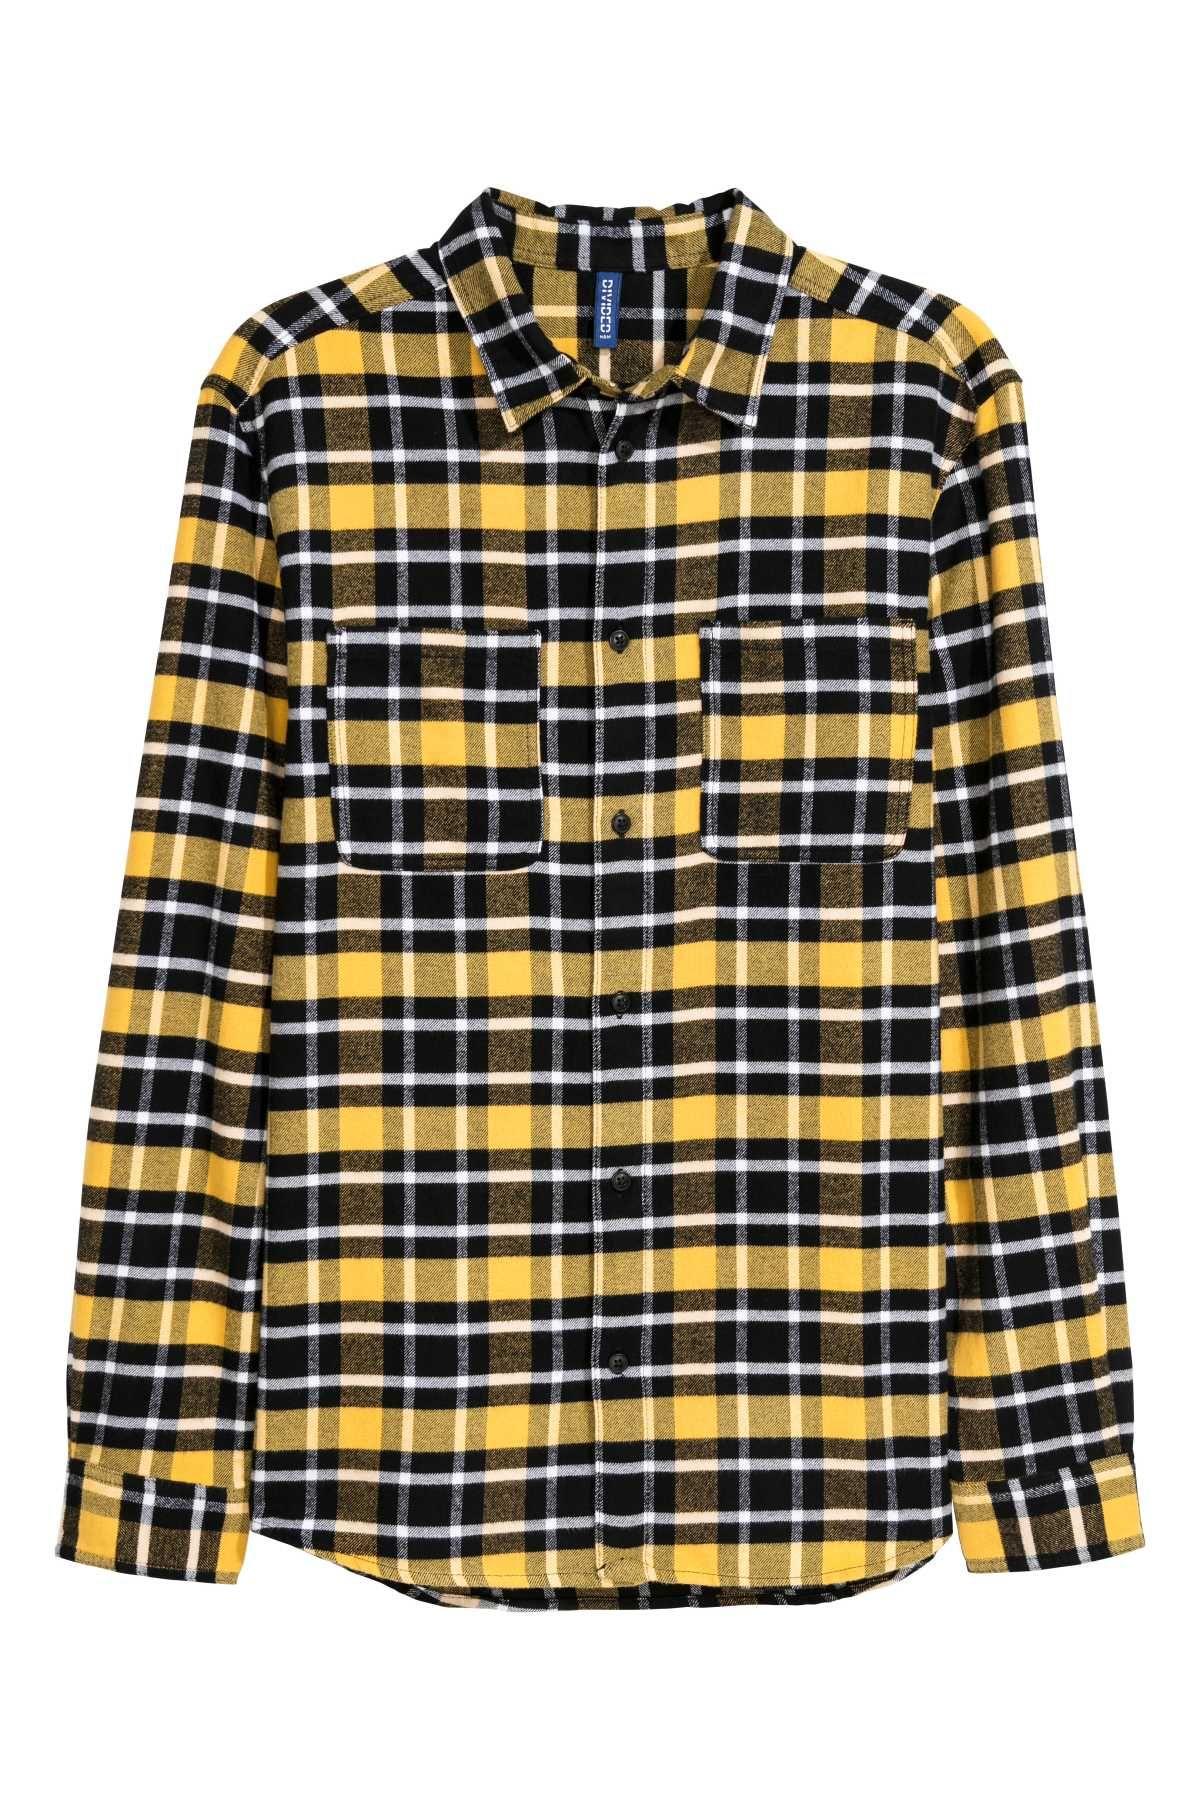 Flannel shirt ideas  Yellowblack plaid Plaid flannel shirt with collar and a chest